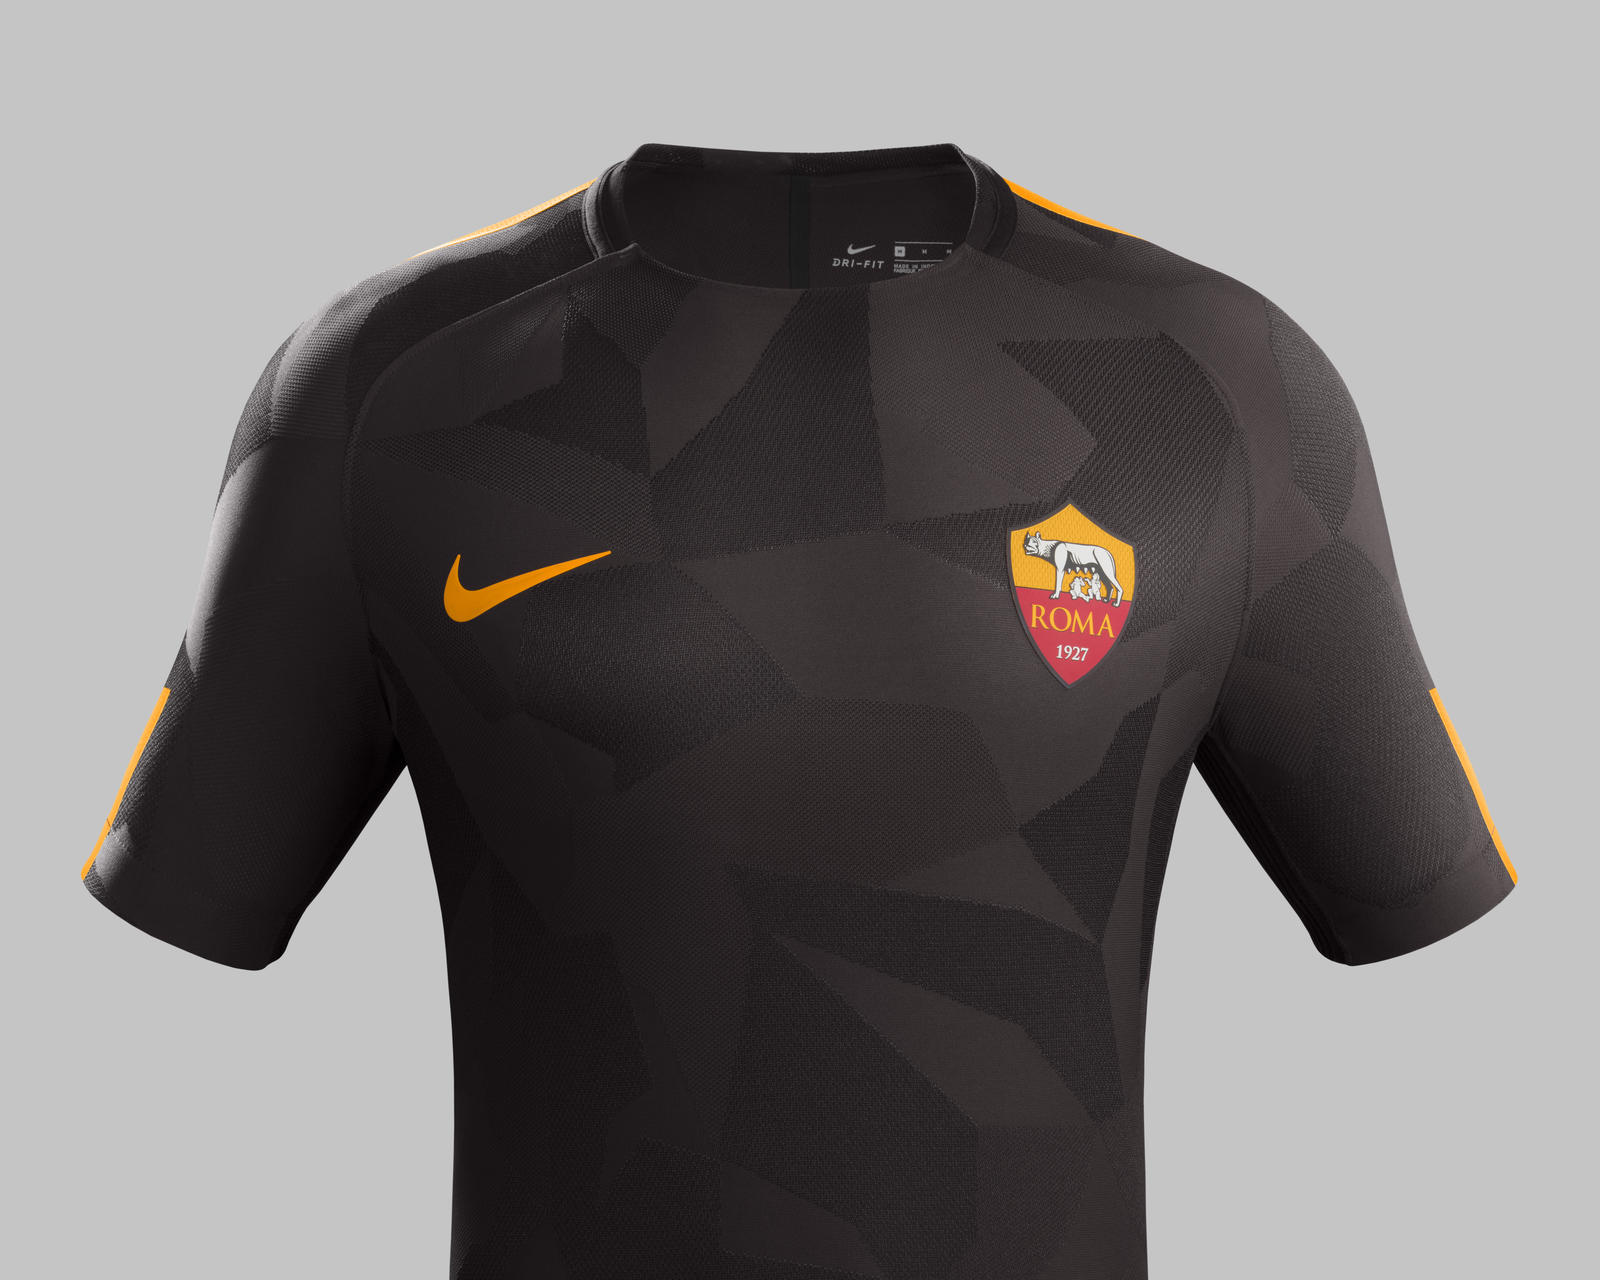 ensemble de foot ROMA de foot